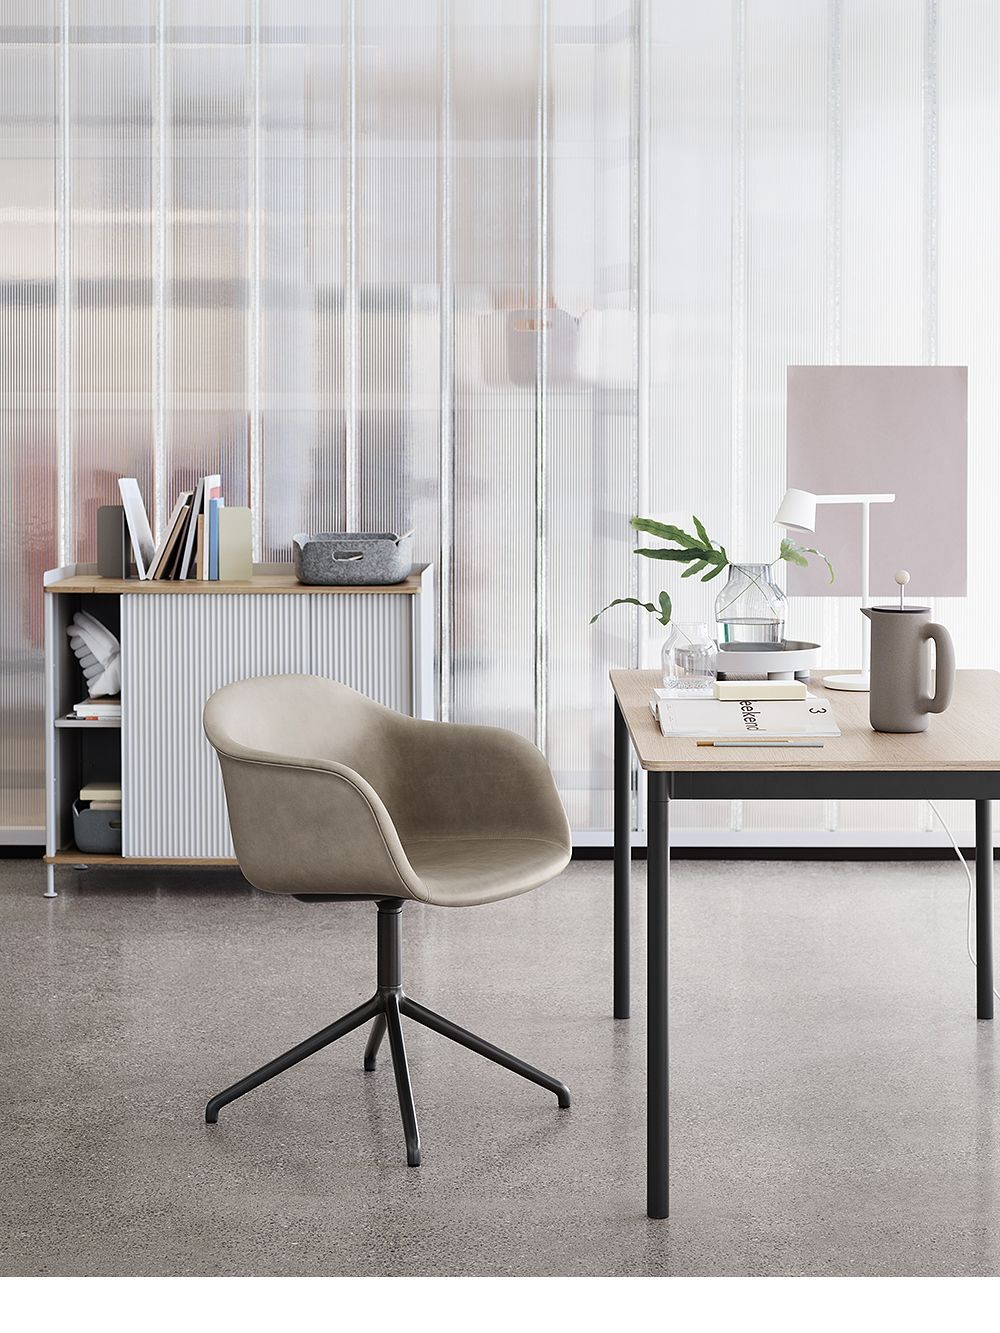 Muuto's Fiber chair.